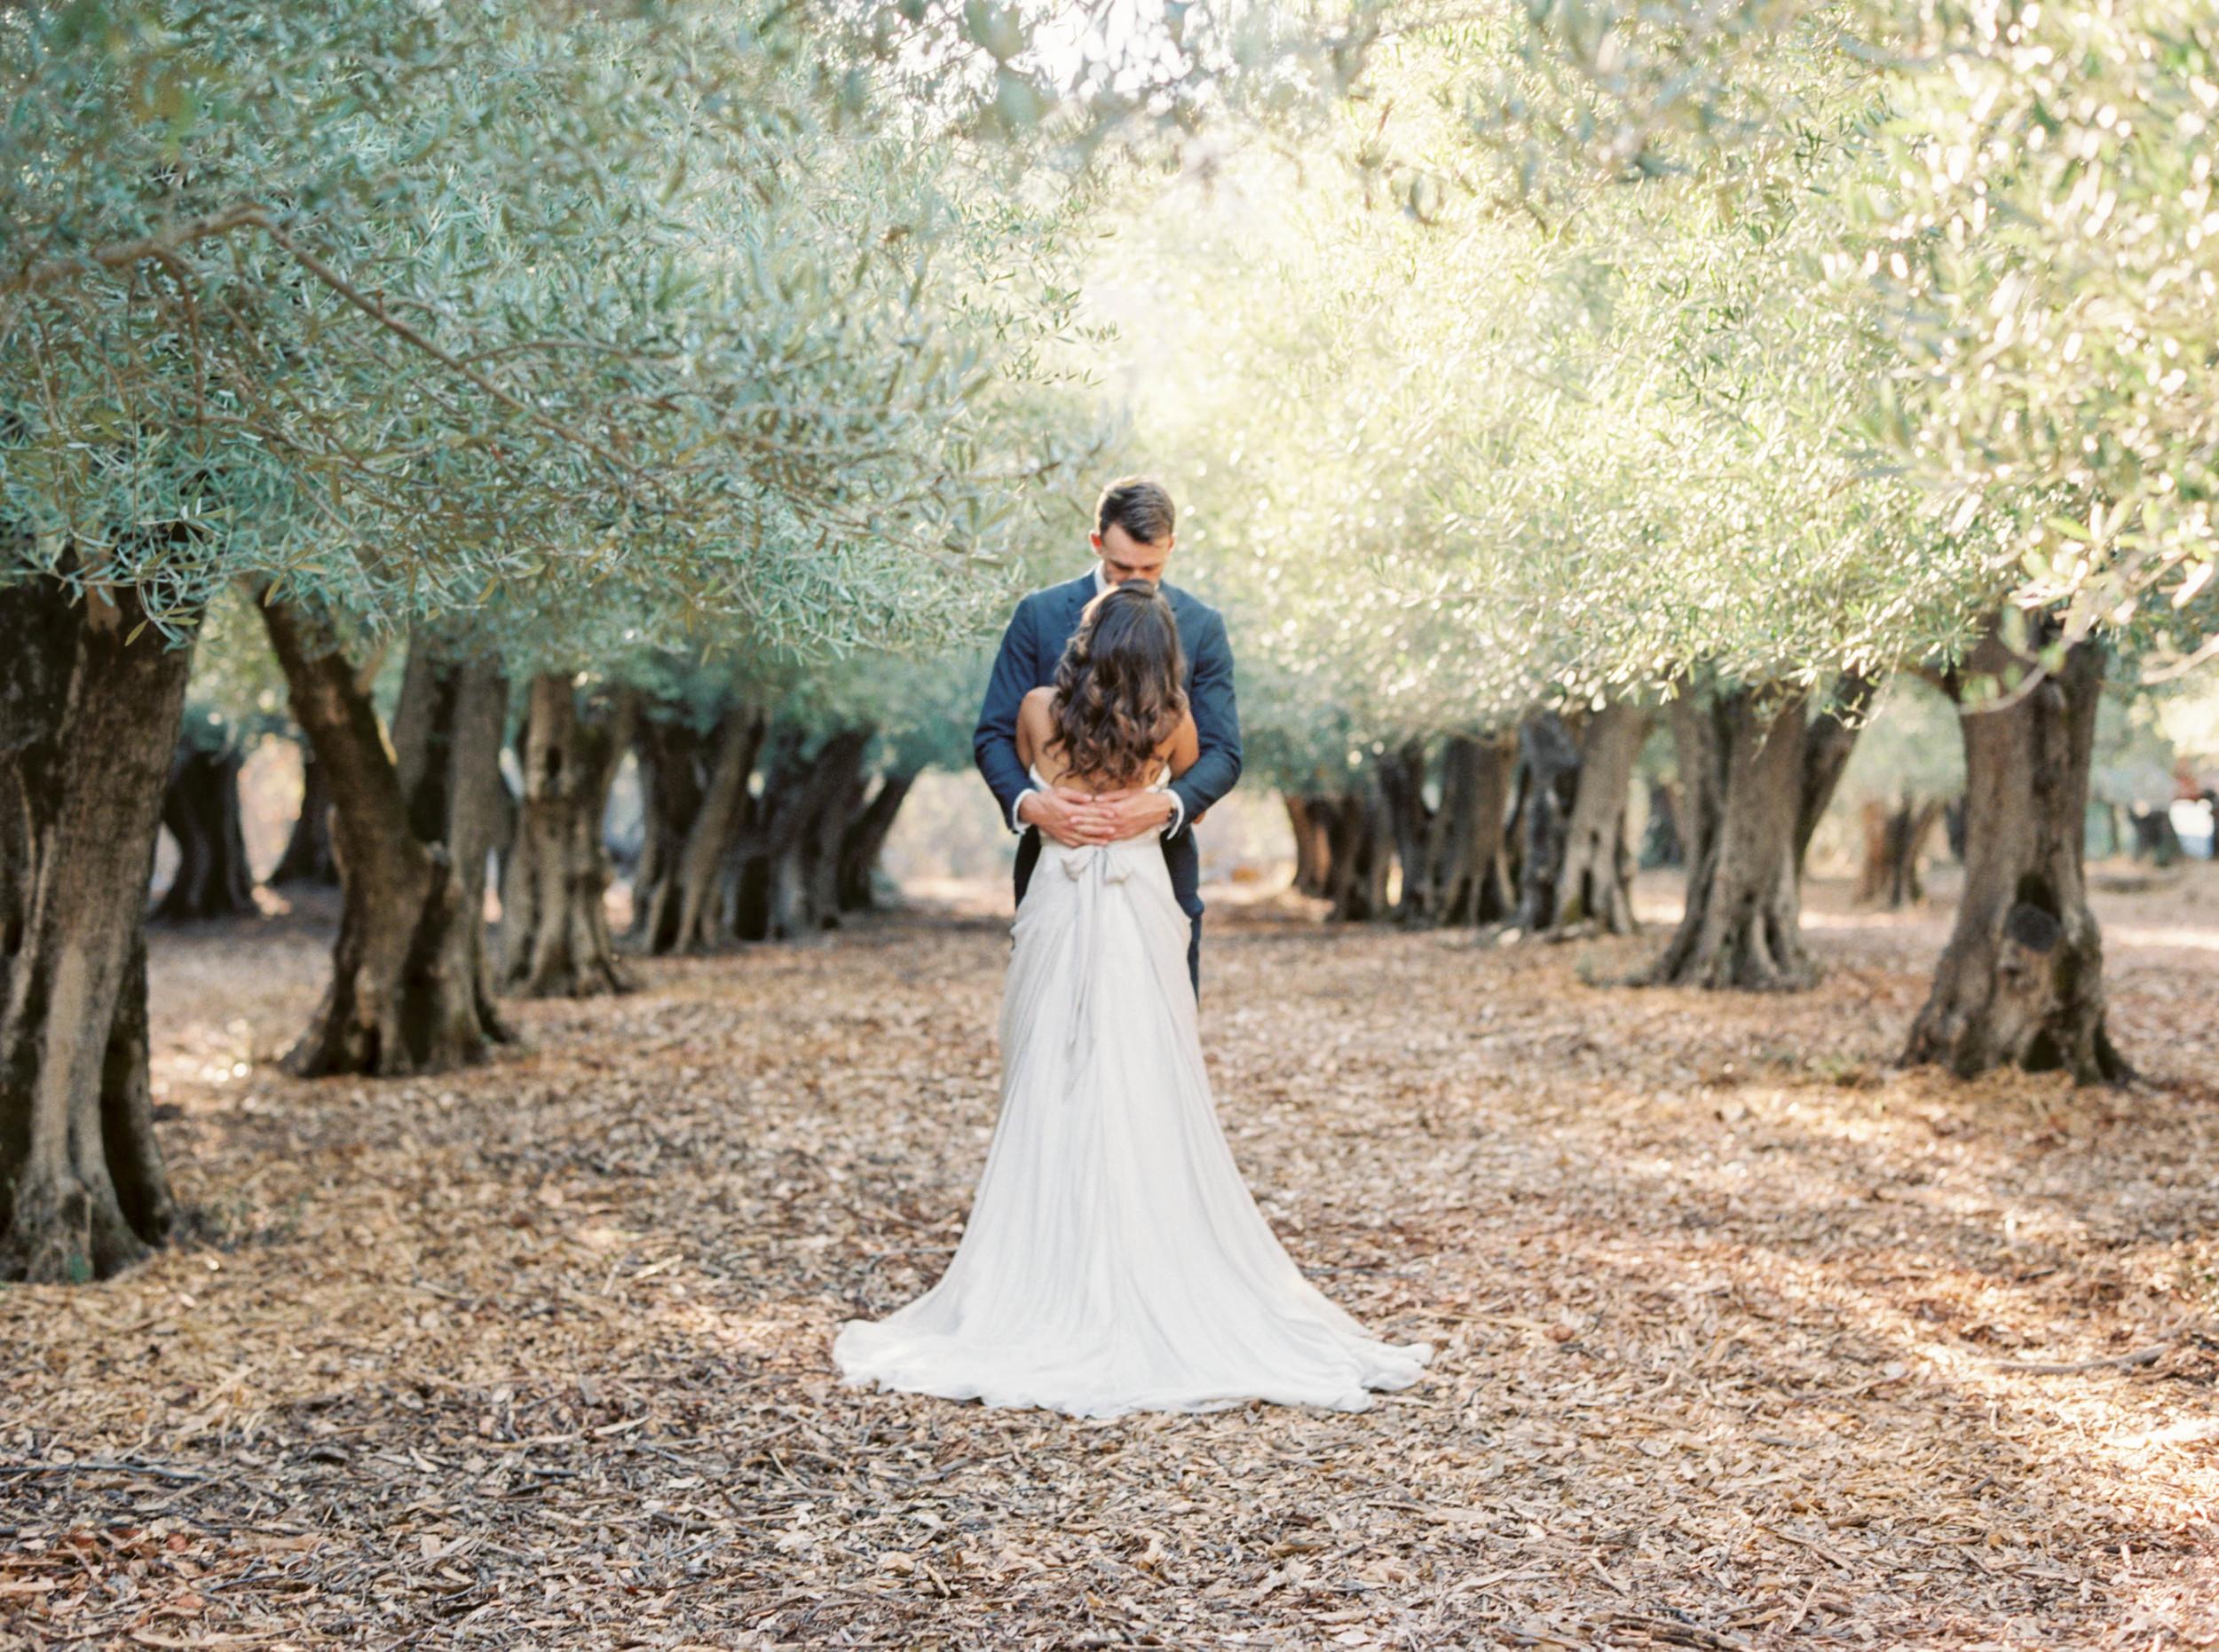 Meghan Mehan Photography - Fine Art Film Photography - San Francisco   Napa   Sonoma   Santa Barbara   Big Sur - 063.jpg